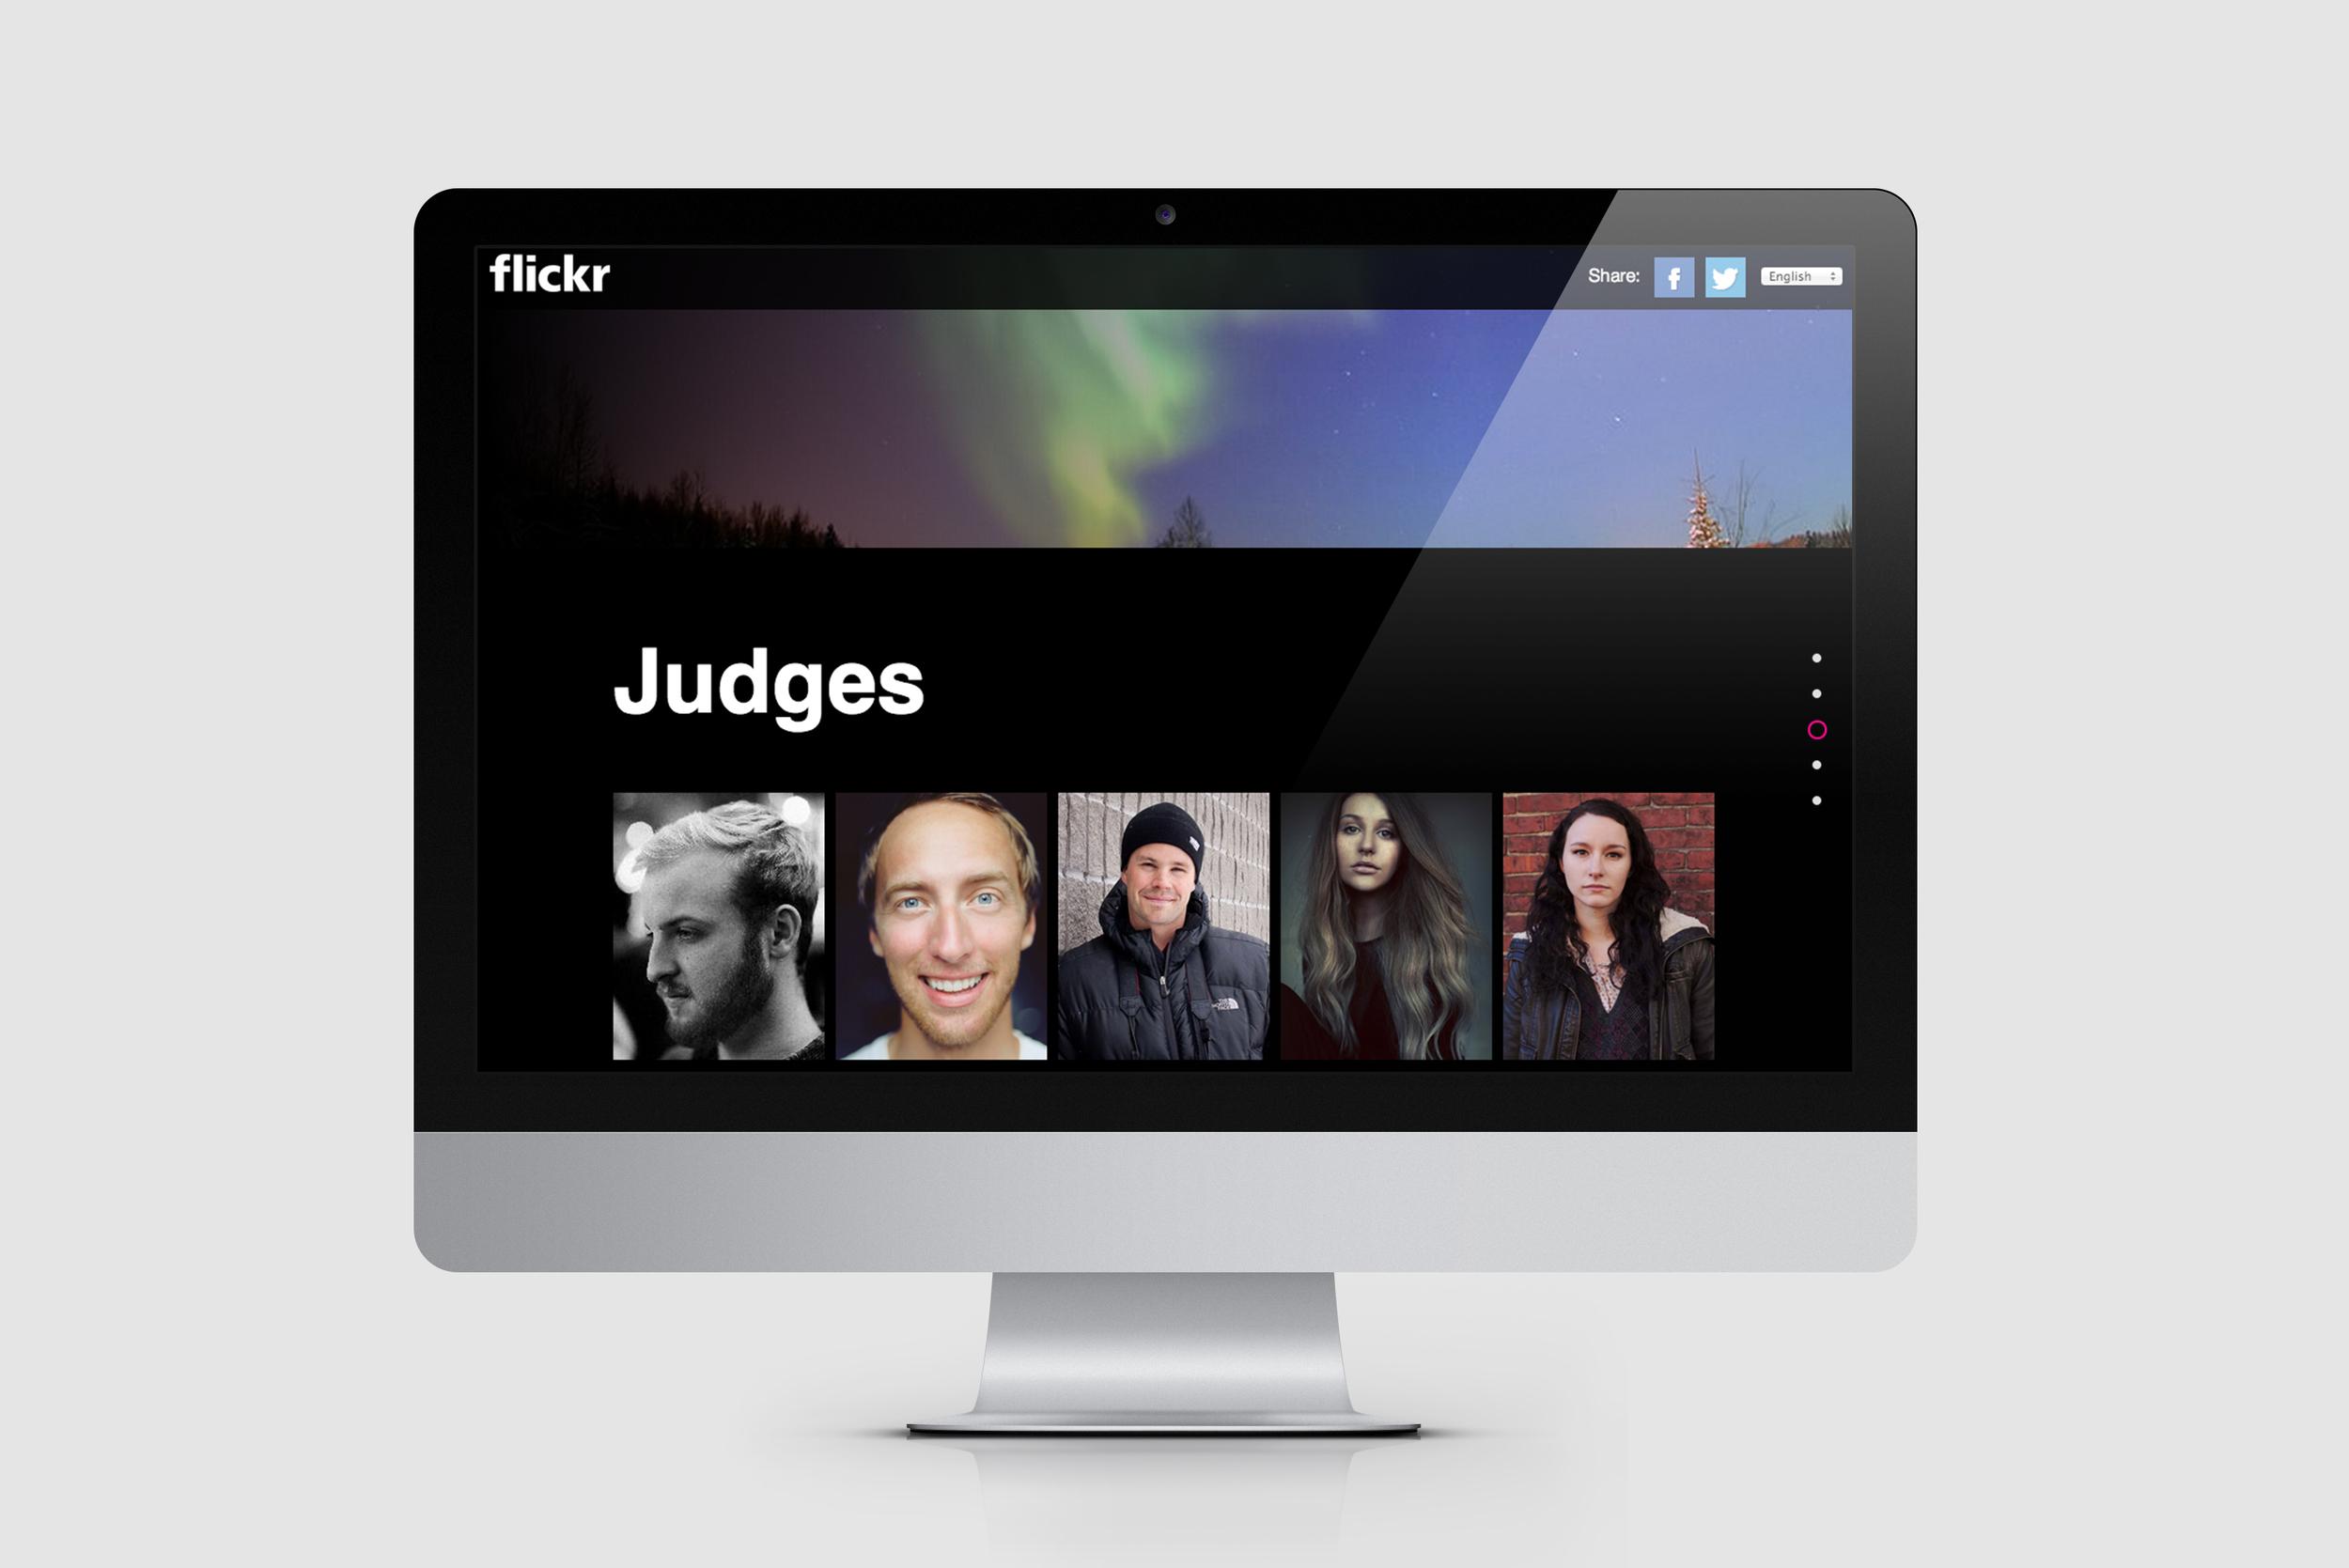 12 Days of Flickr Judges